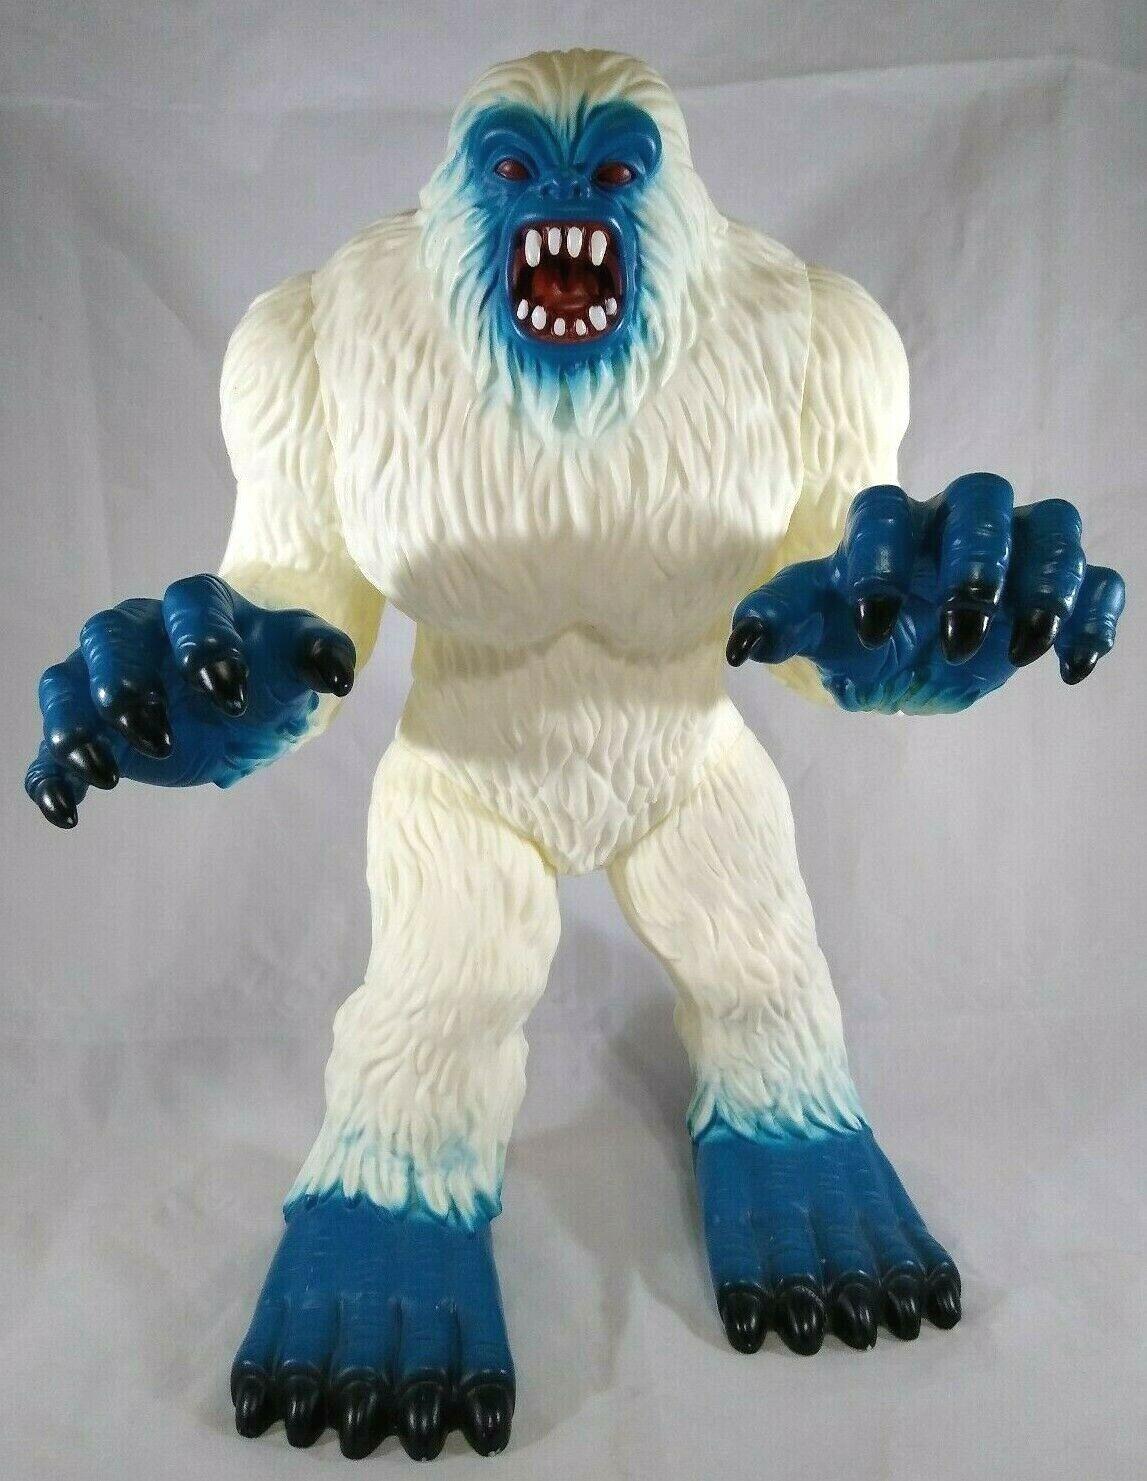 Giant 16 Yeti giocattoli R Us Exclusive Animal Planet cifra